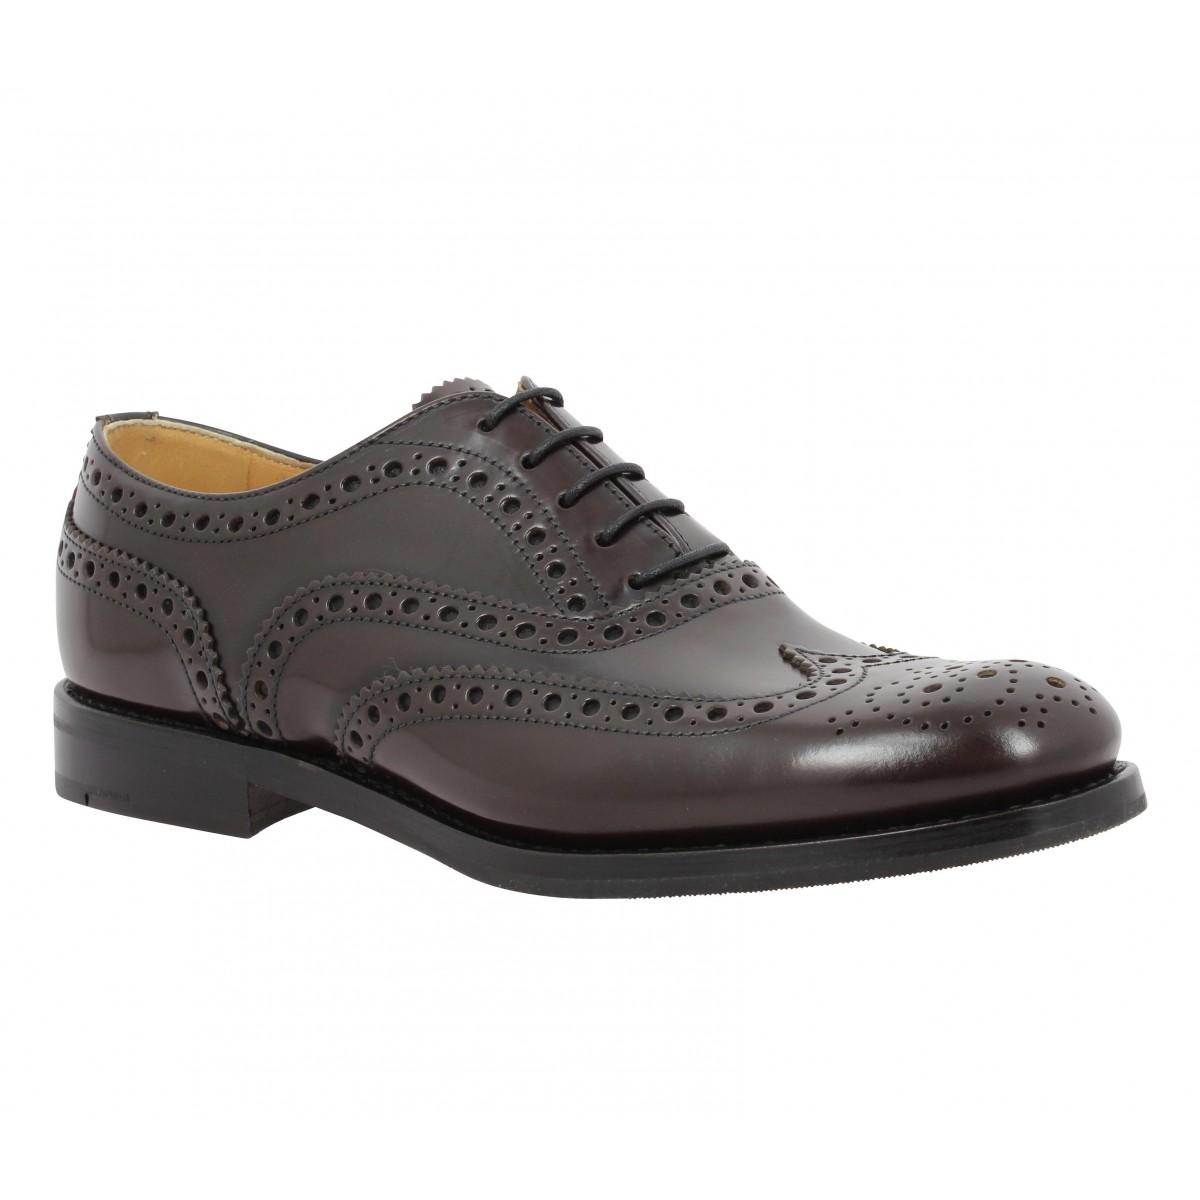 Chaussures à lacets CHURCH'S Burwood cuir Femme Ebony